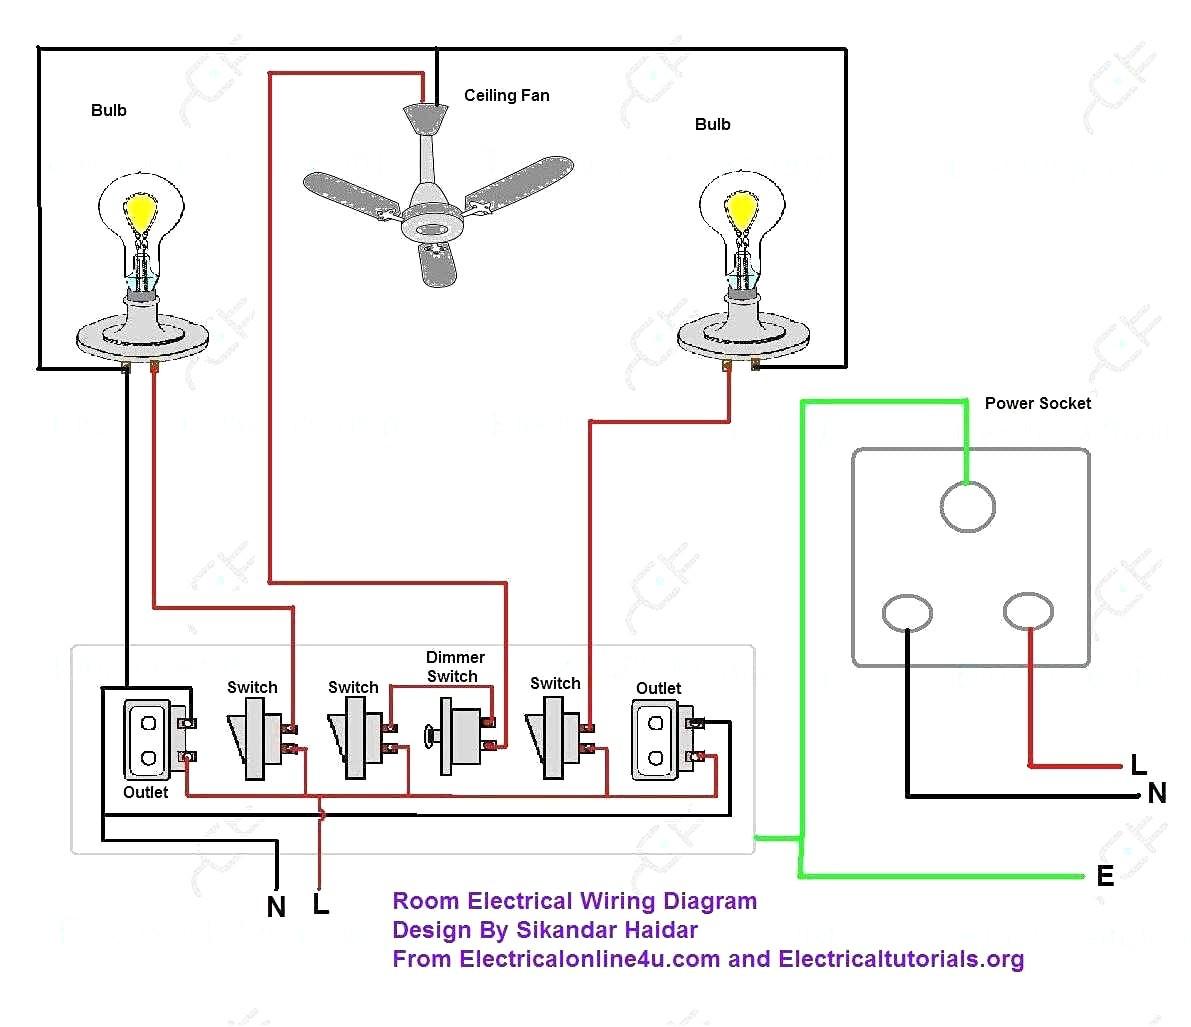 Electrical Room Wiring Diagram - Wiring Diagrams Thumbs - Residential Wiring Diagram